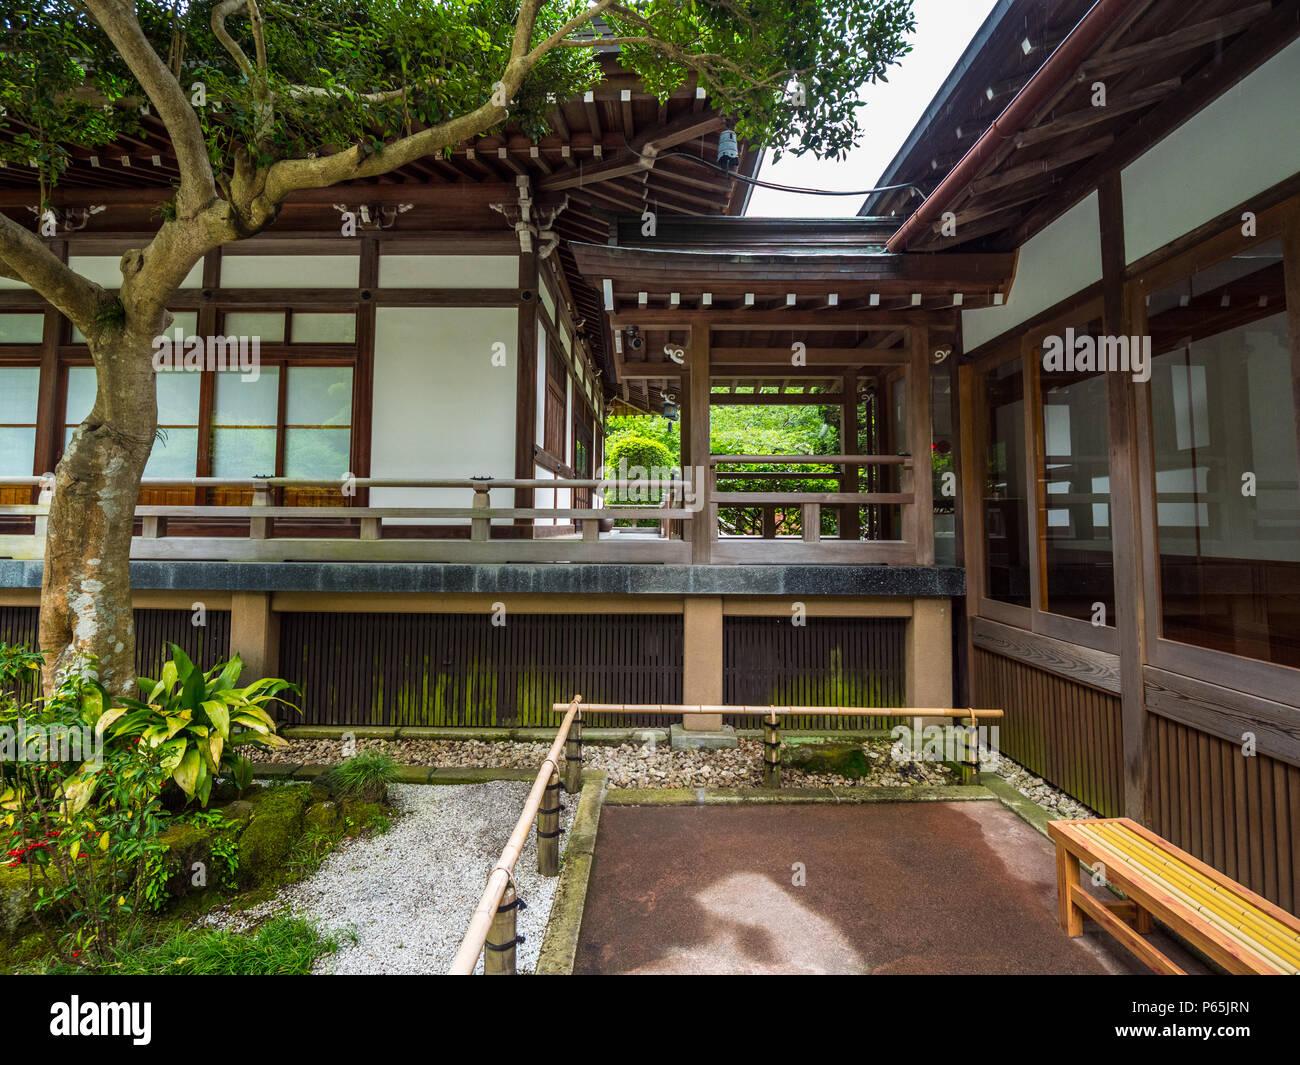 case tradizionali giapponesi a kamakura tokyo giappone